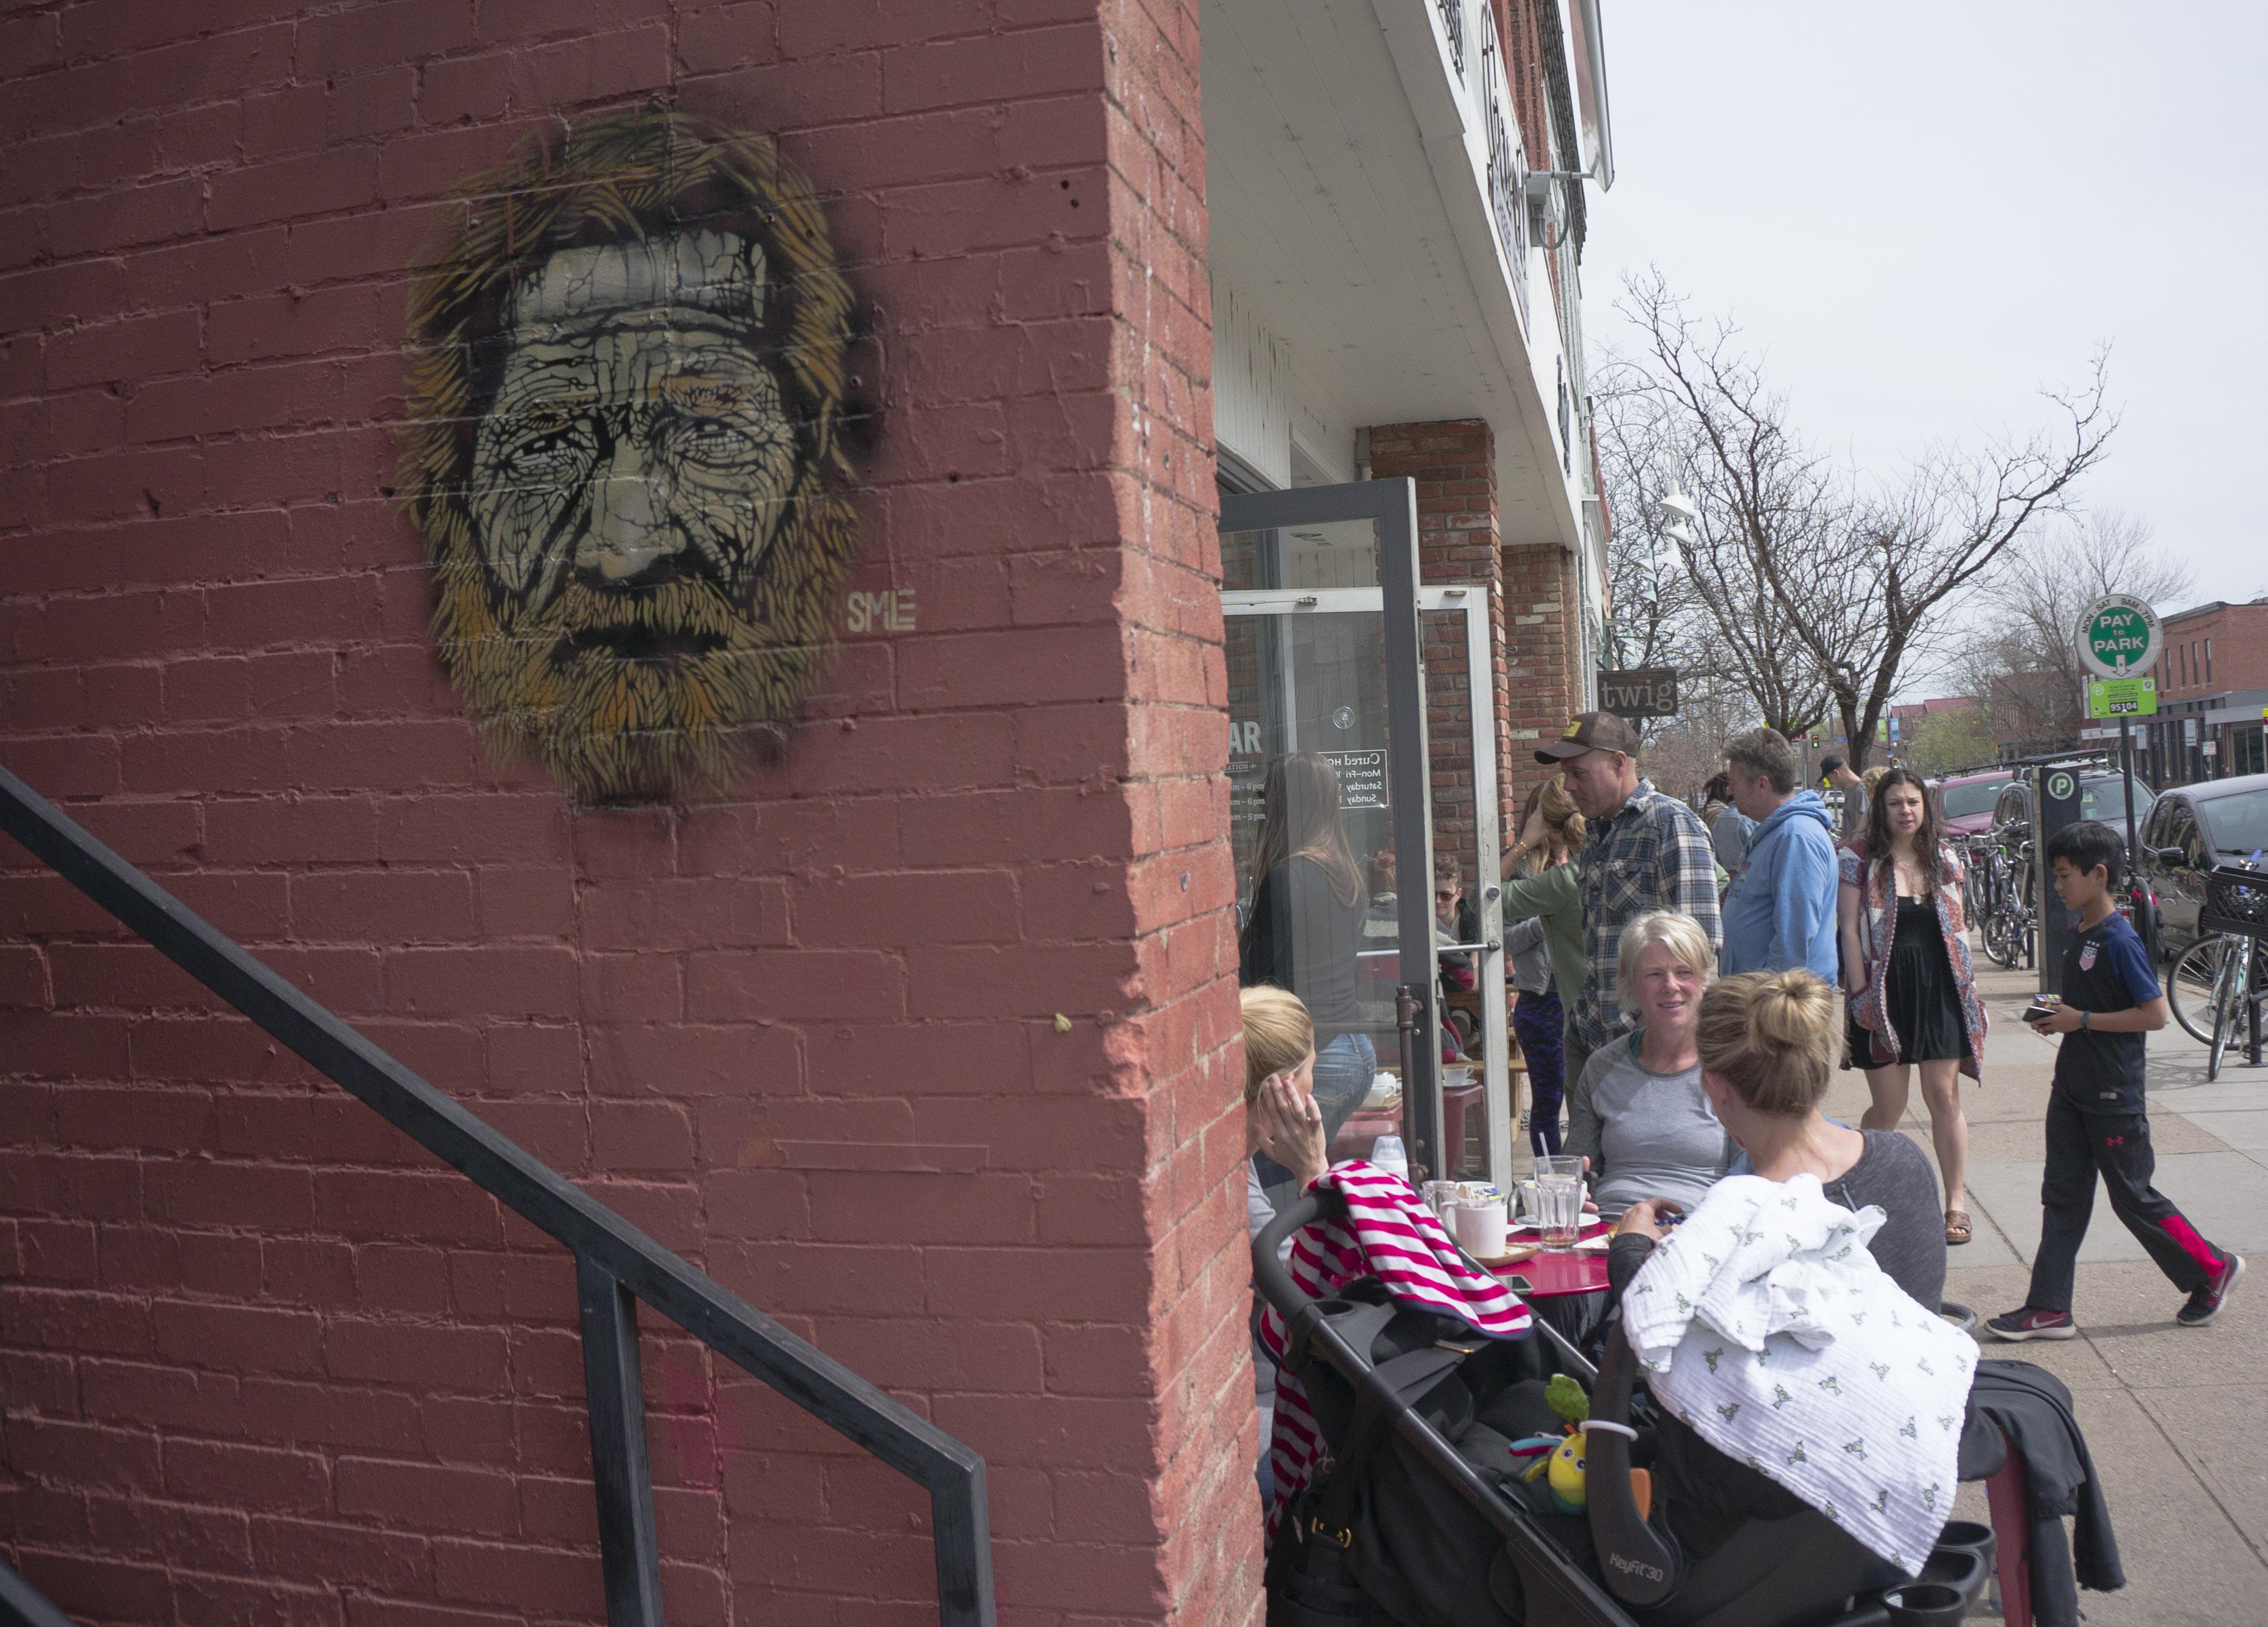 Photo: SMiLE artwork, Homeless Man Portrait, Pearl Street